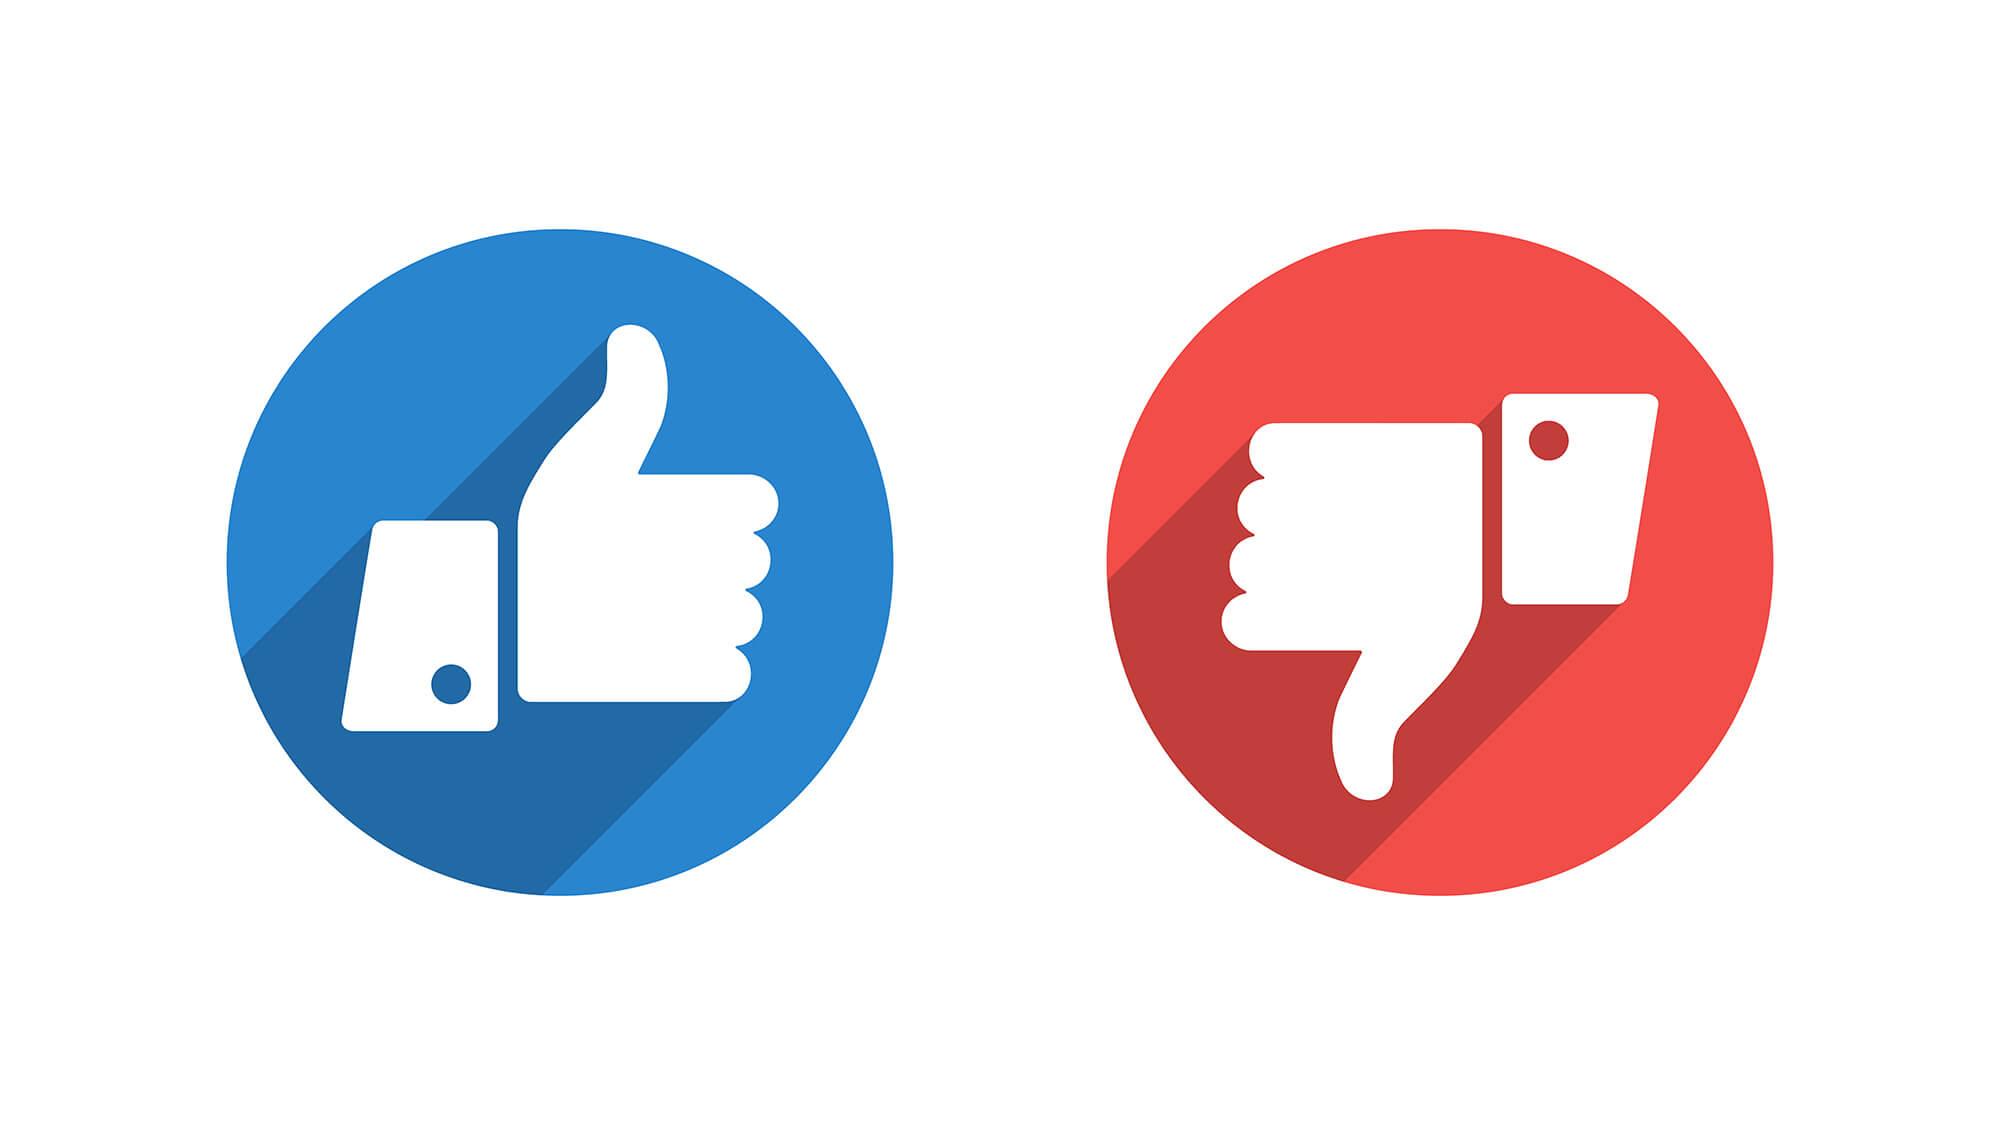 How to Make a Website Like Facebook?